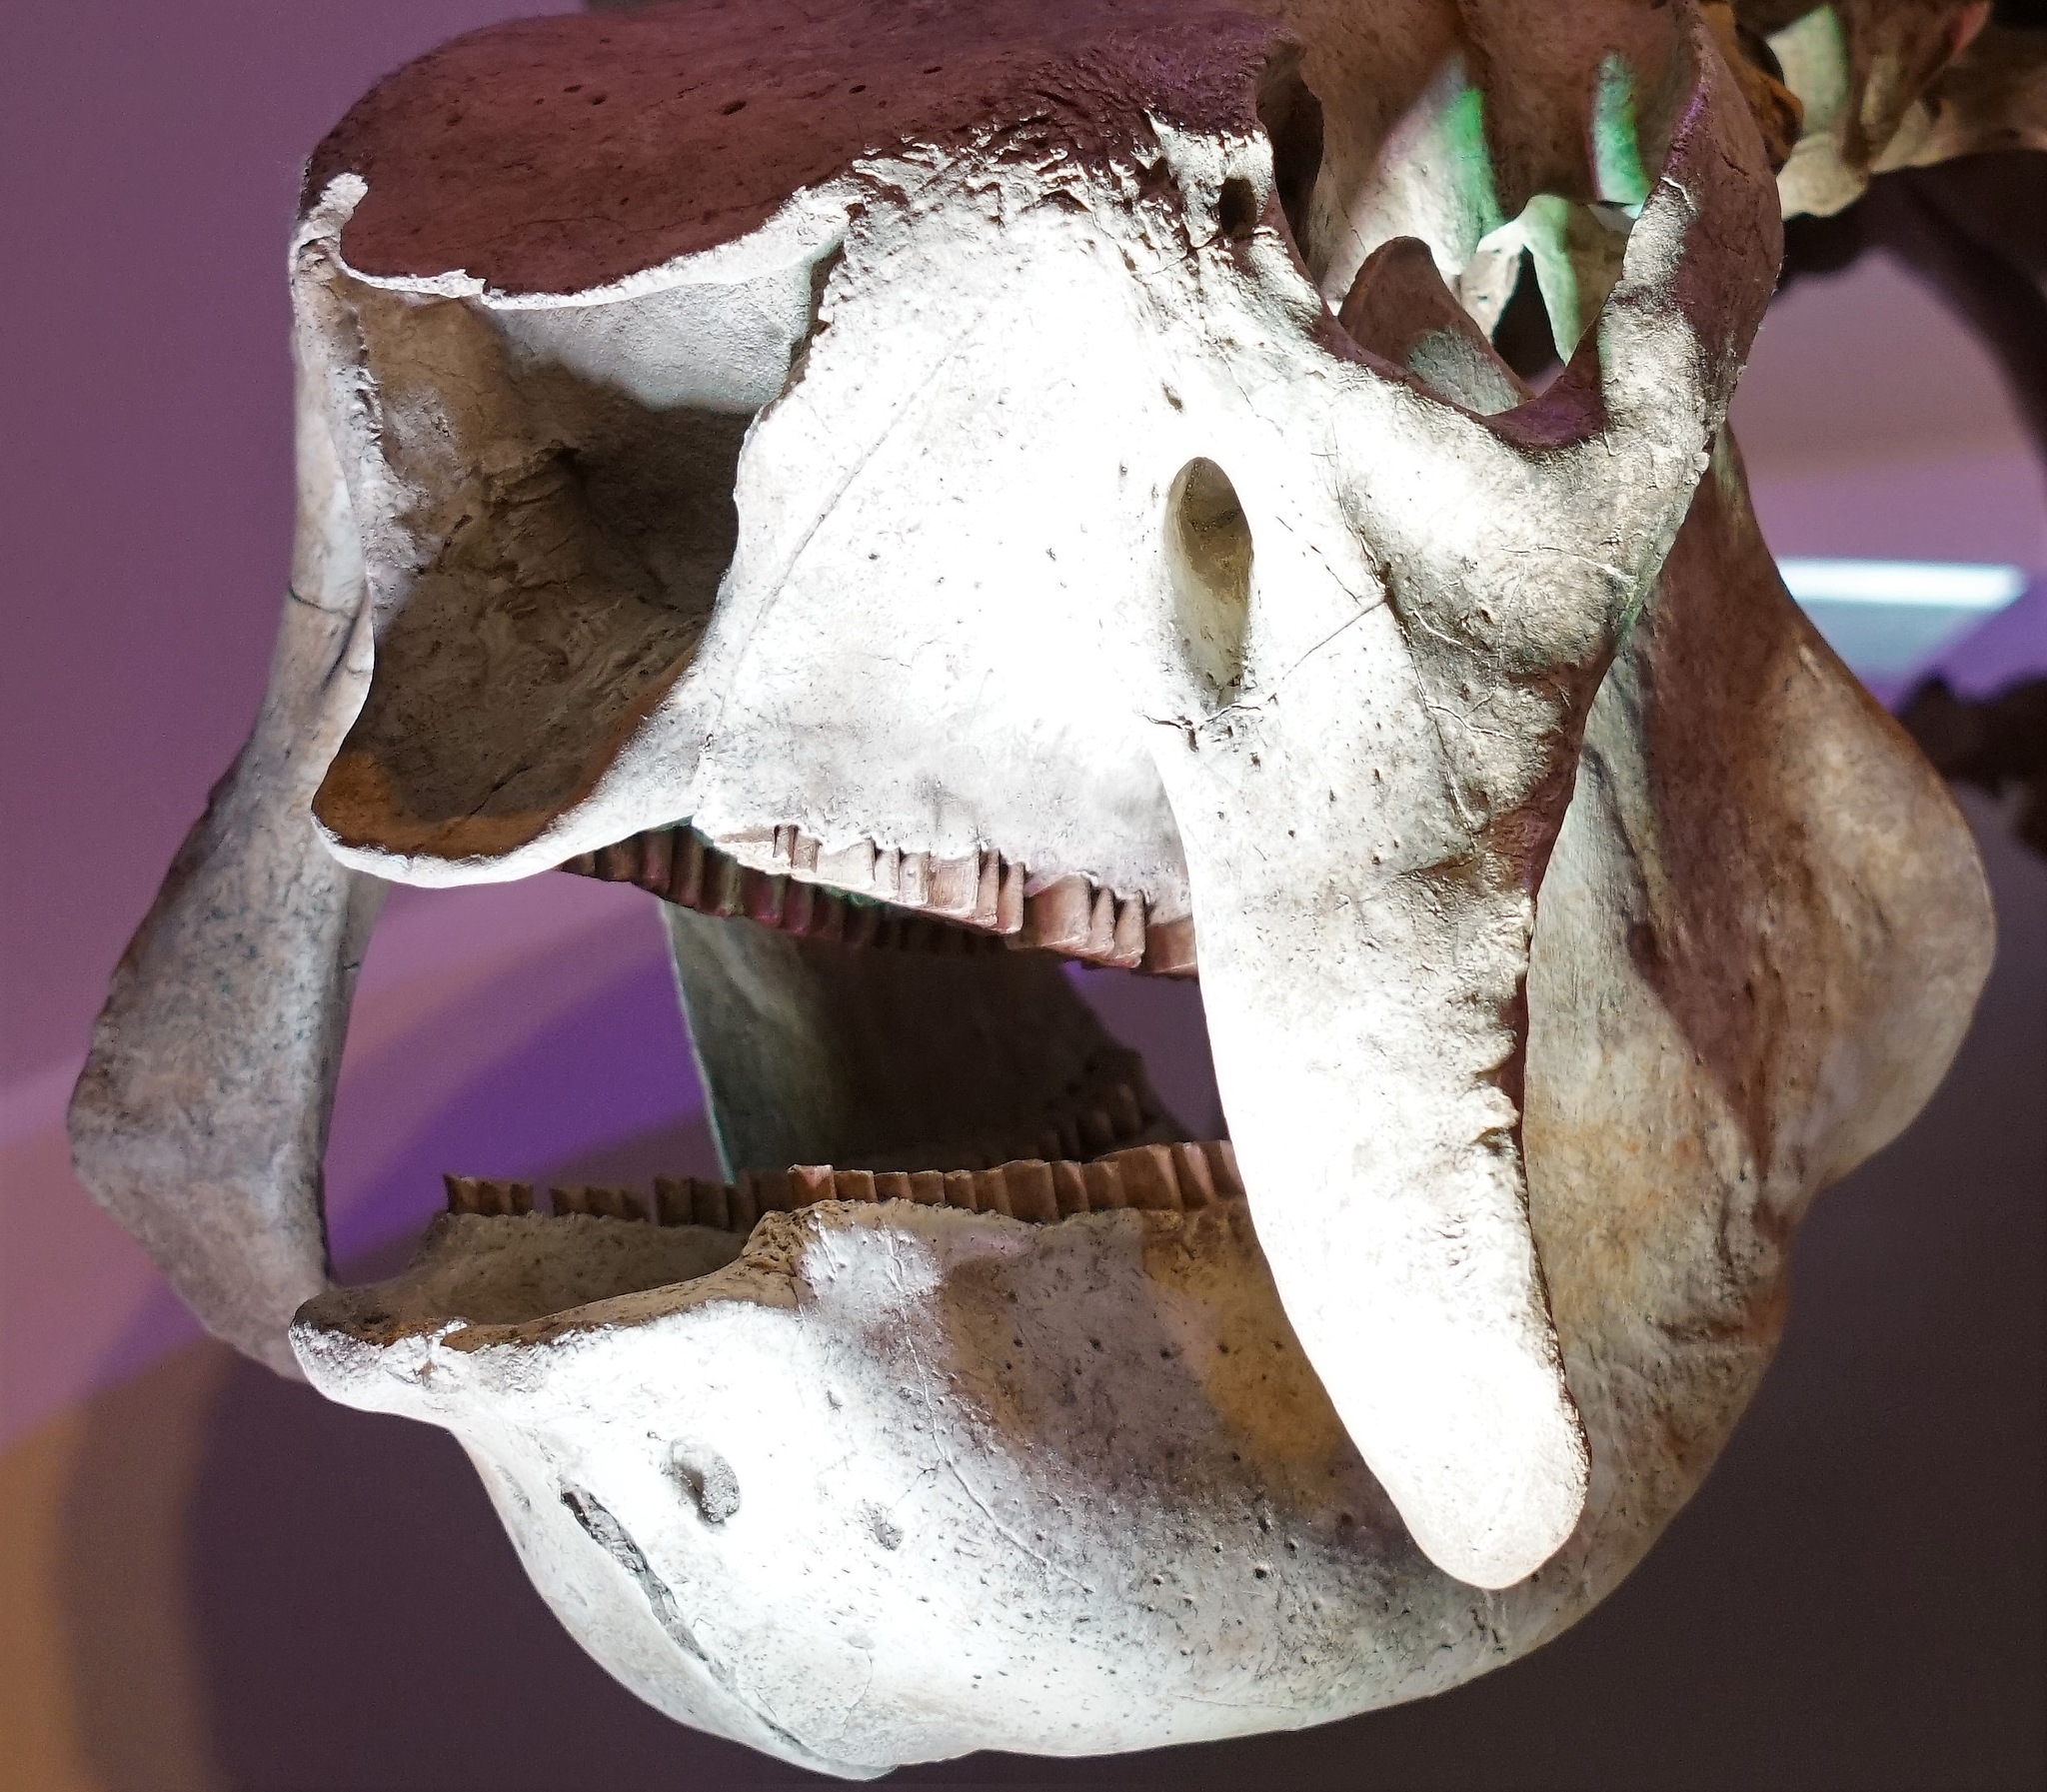 Giant Pre-historic Armadillo Chomp-Per's   by MichaelDorsey